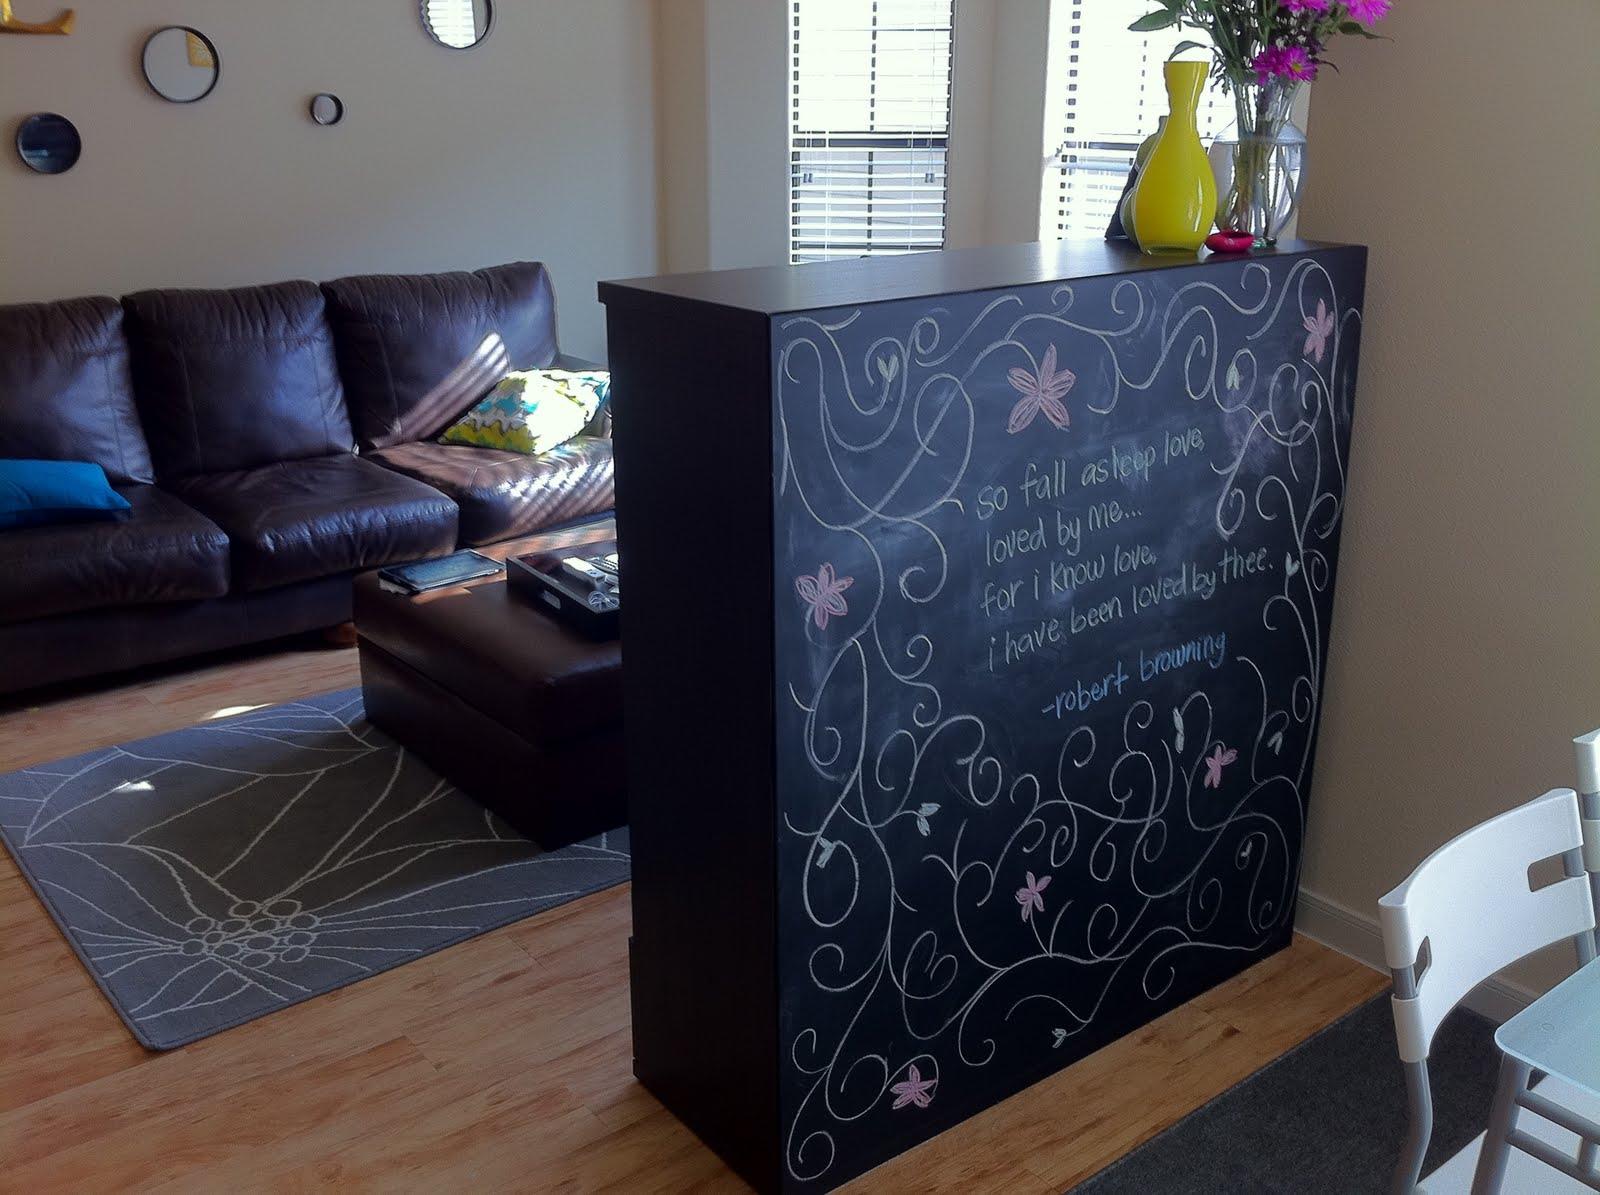 Ikea Ideas To Divide A Room ~ Besta Boas Chalkboard Room Divider  IKEA Hackers  IKEA Hackers